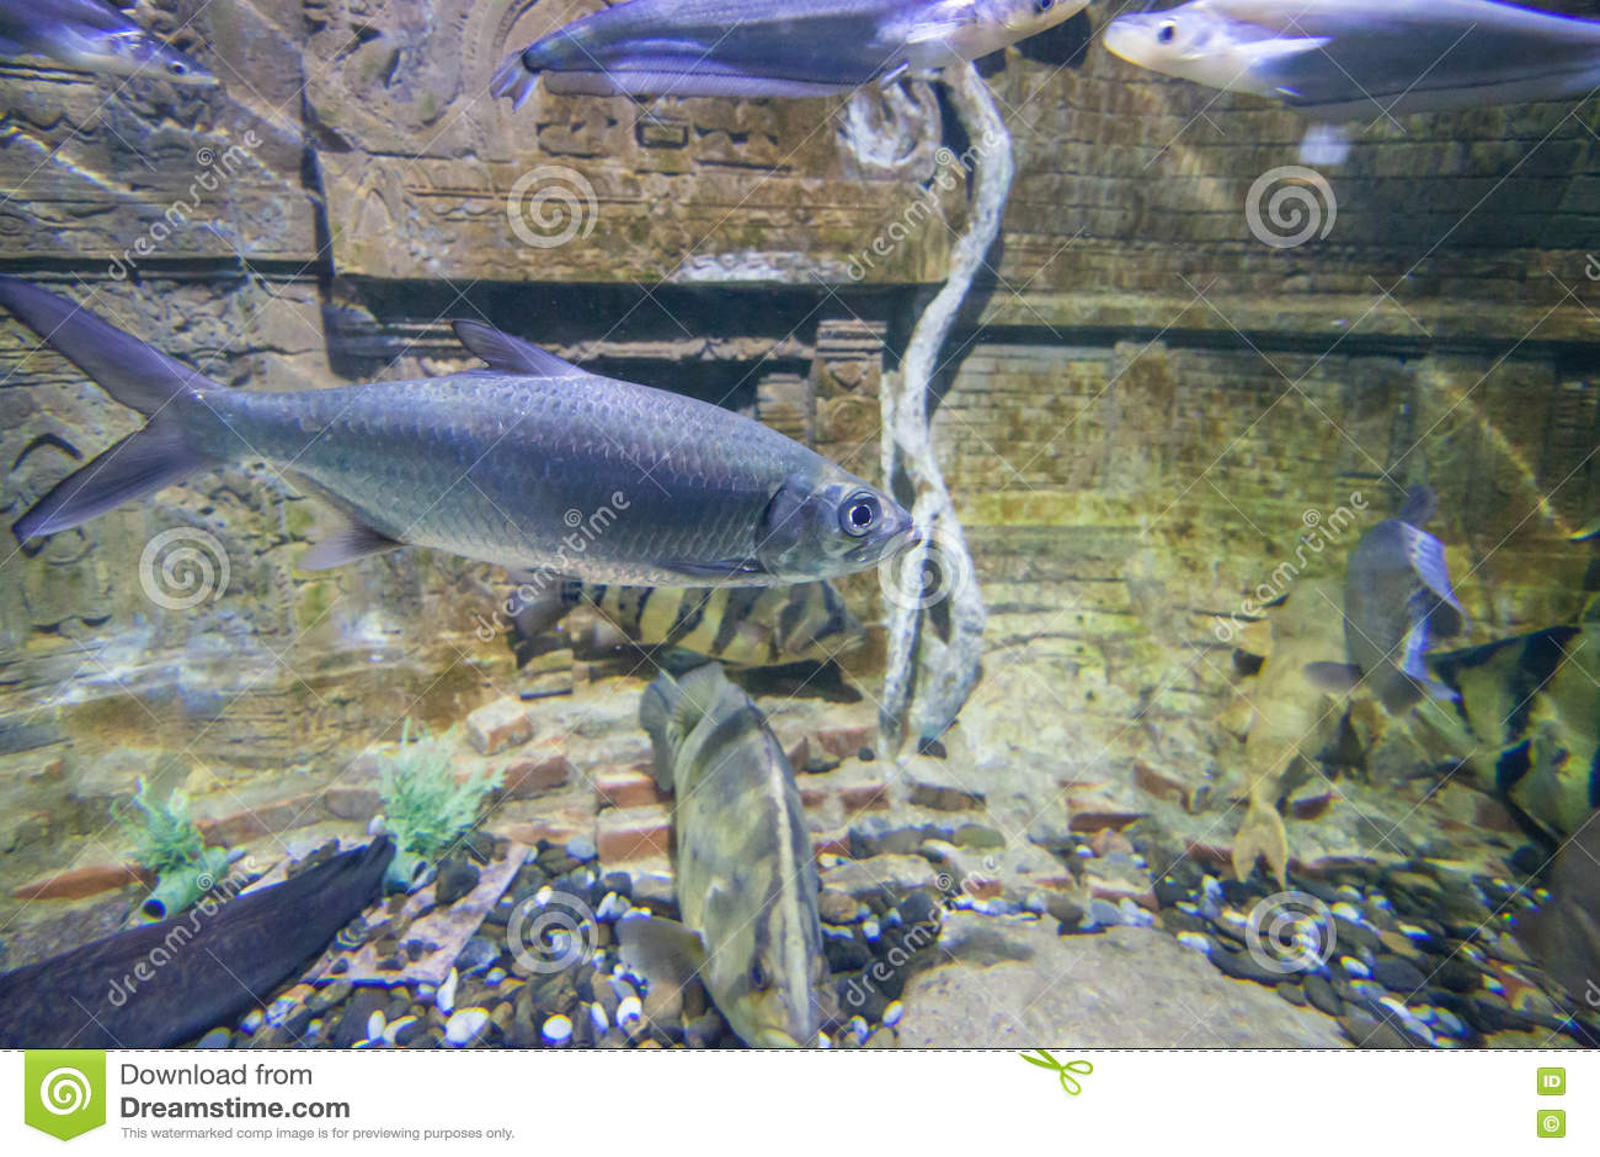 The fish in the fish tank stock photo image 82080549 for Mai mai fish